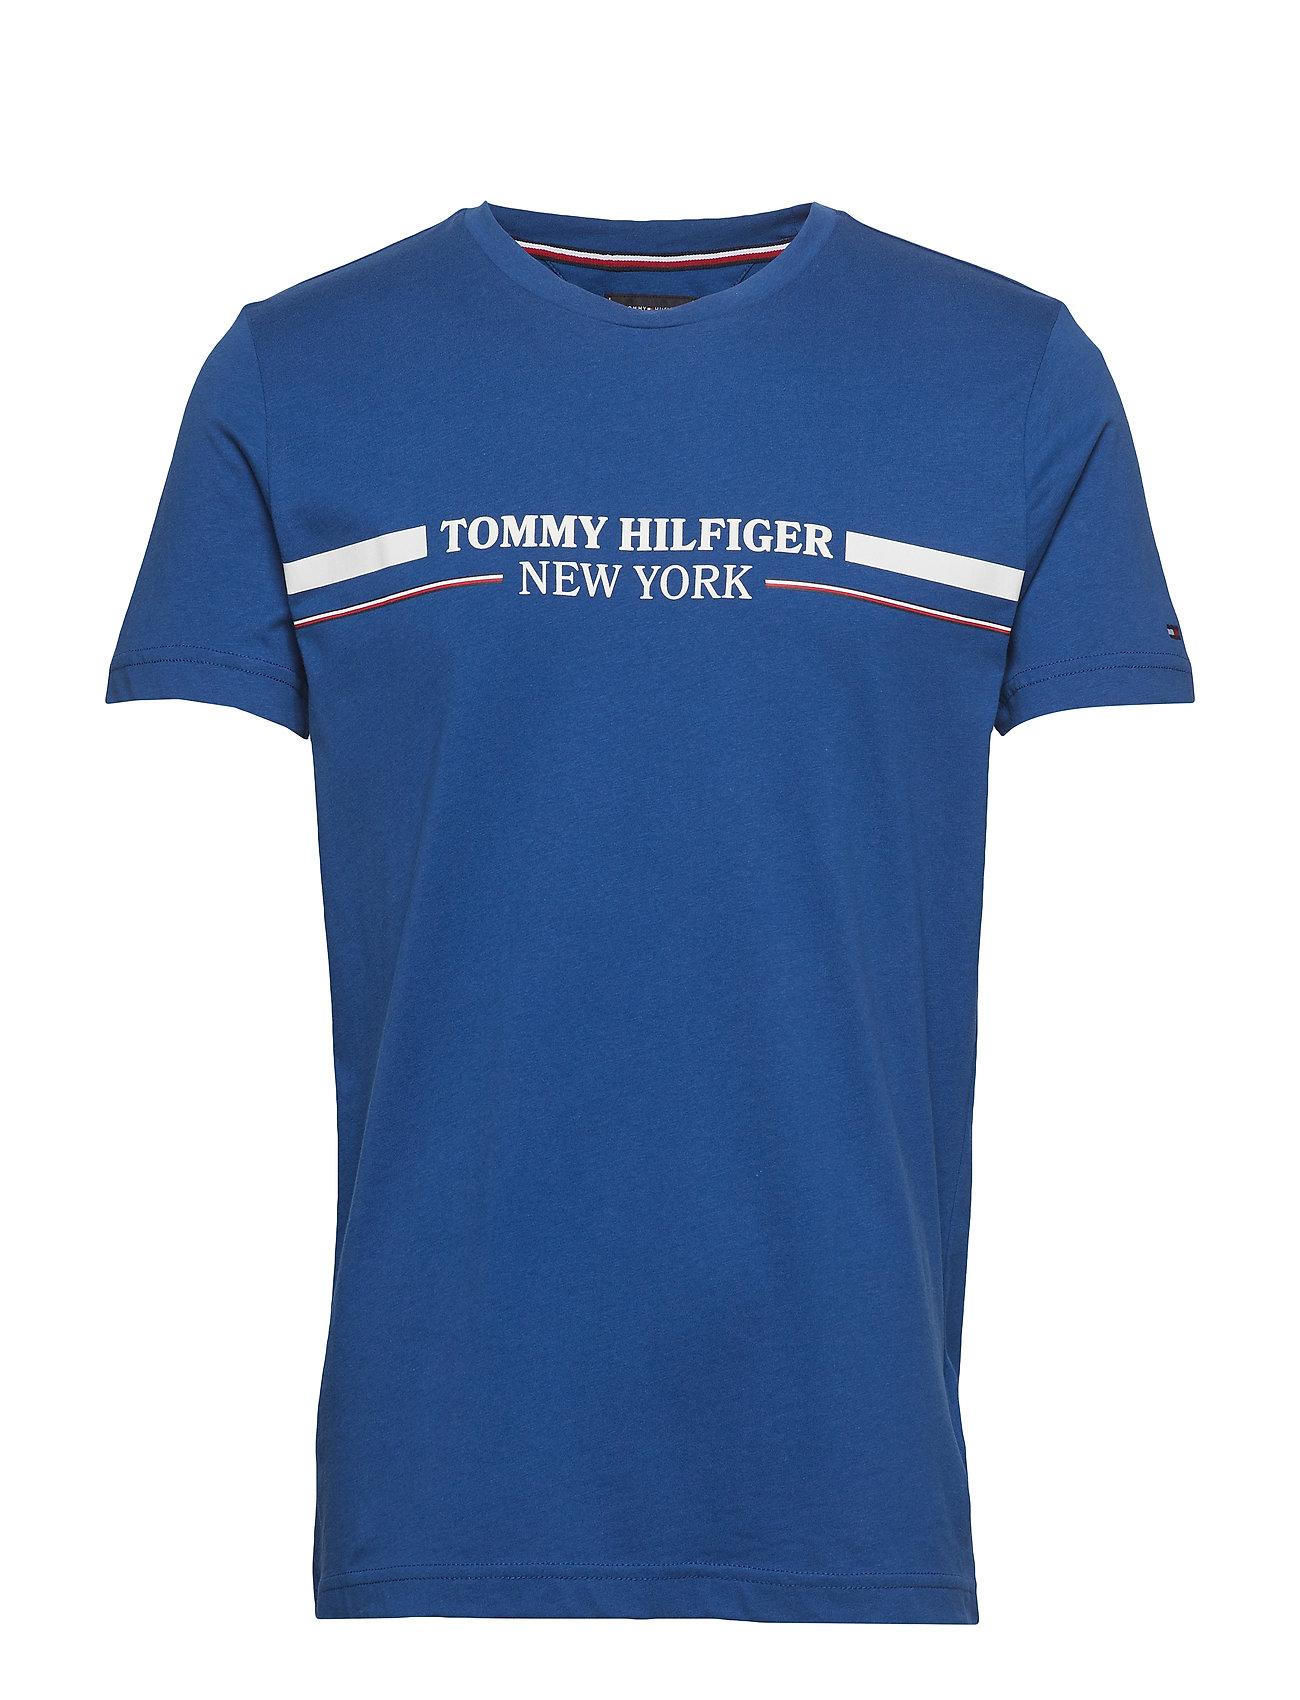 Tommy Hilfiger WCC YACHT STRIPE TEE - BLUE QUARTZ